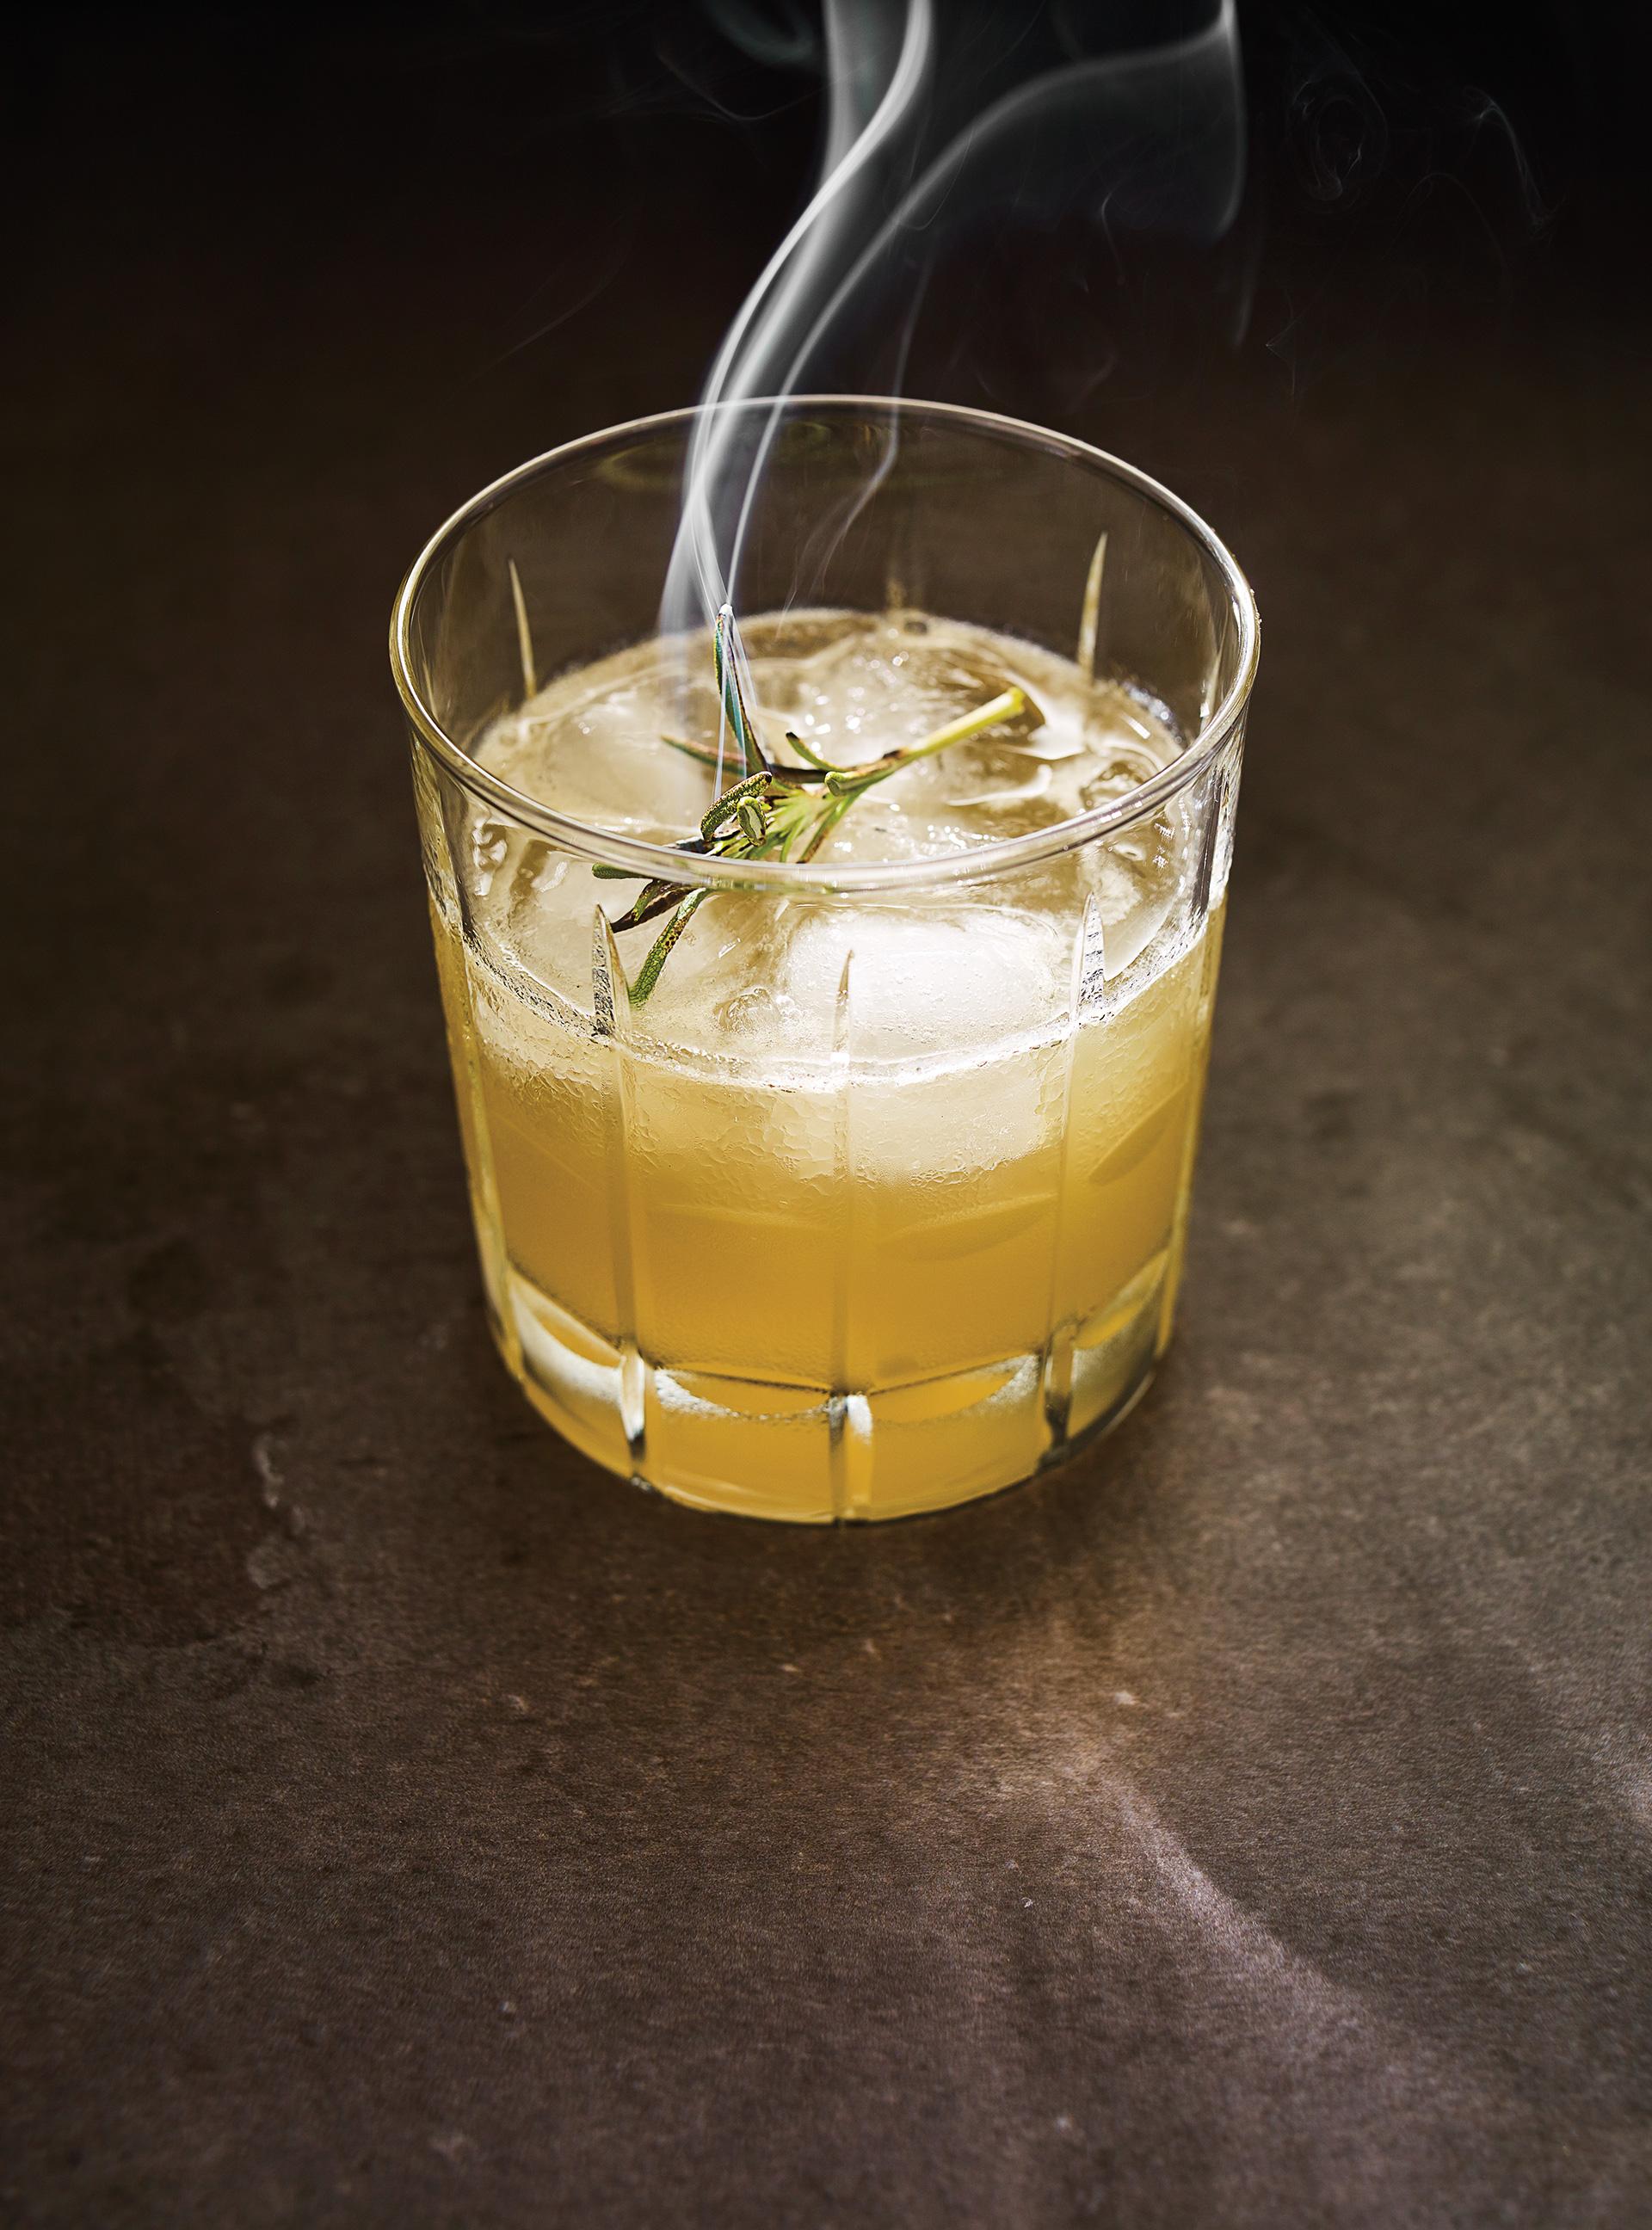 Whisky sour au miel et au romarin brûlé | ricardo